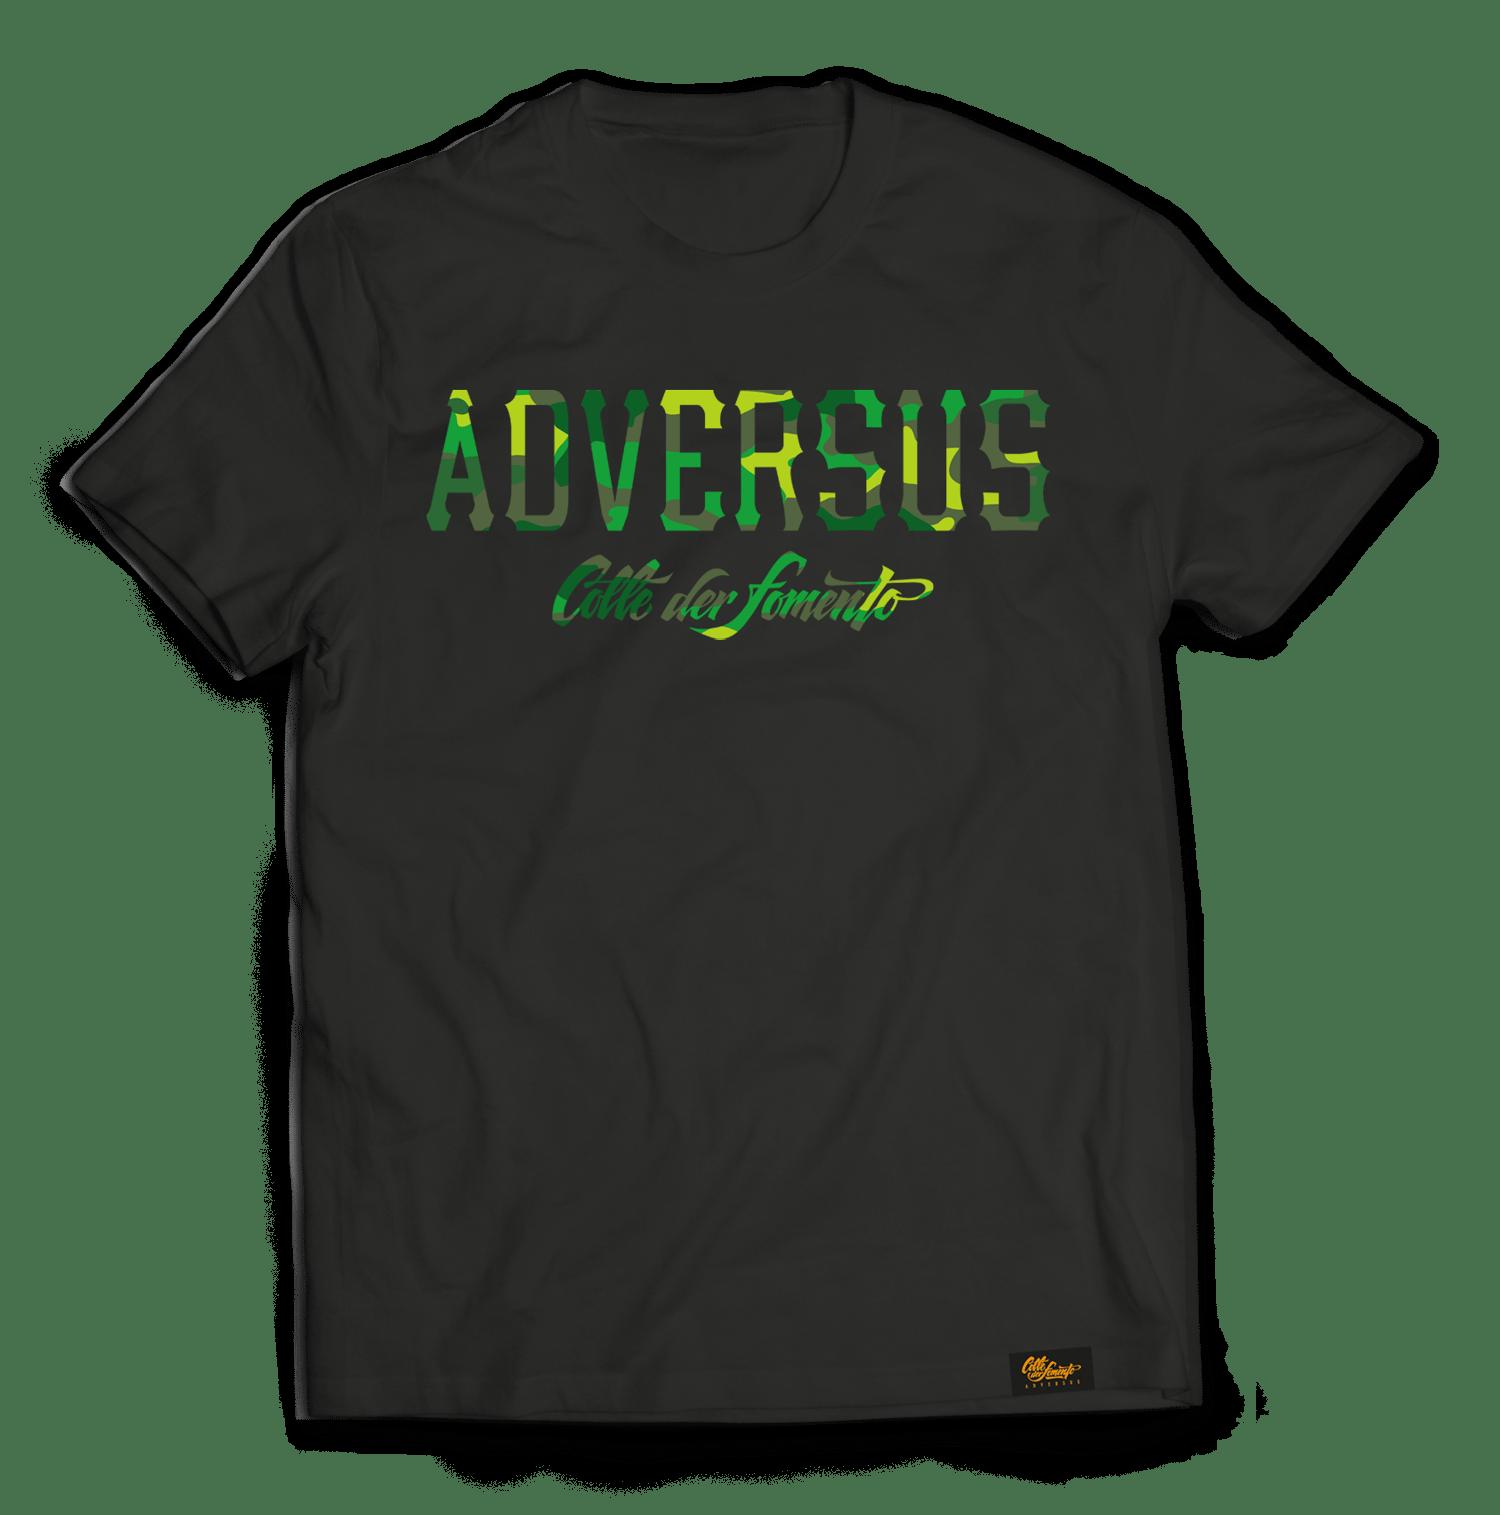 Image of ADVERSUS t-shirt Black